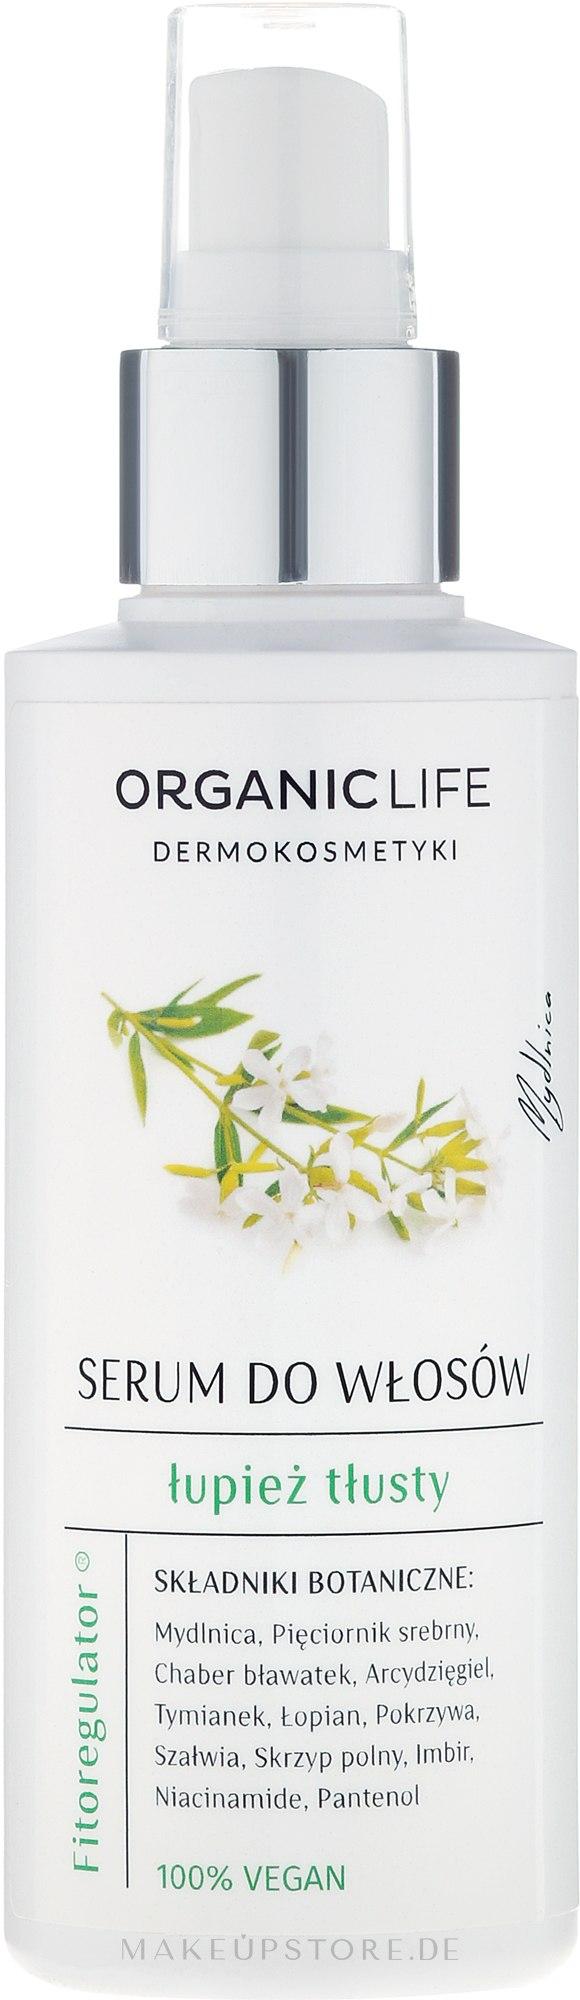 Anti-Schuppen Haarserum - Organic Life Dermocosmetics Serum — Bild 150 g